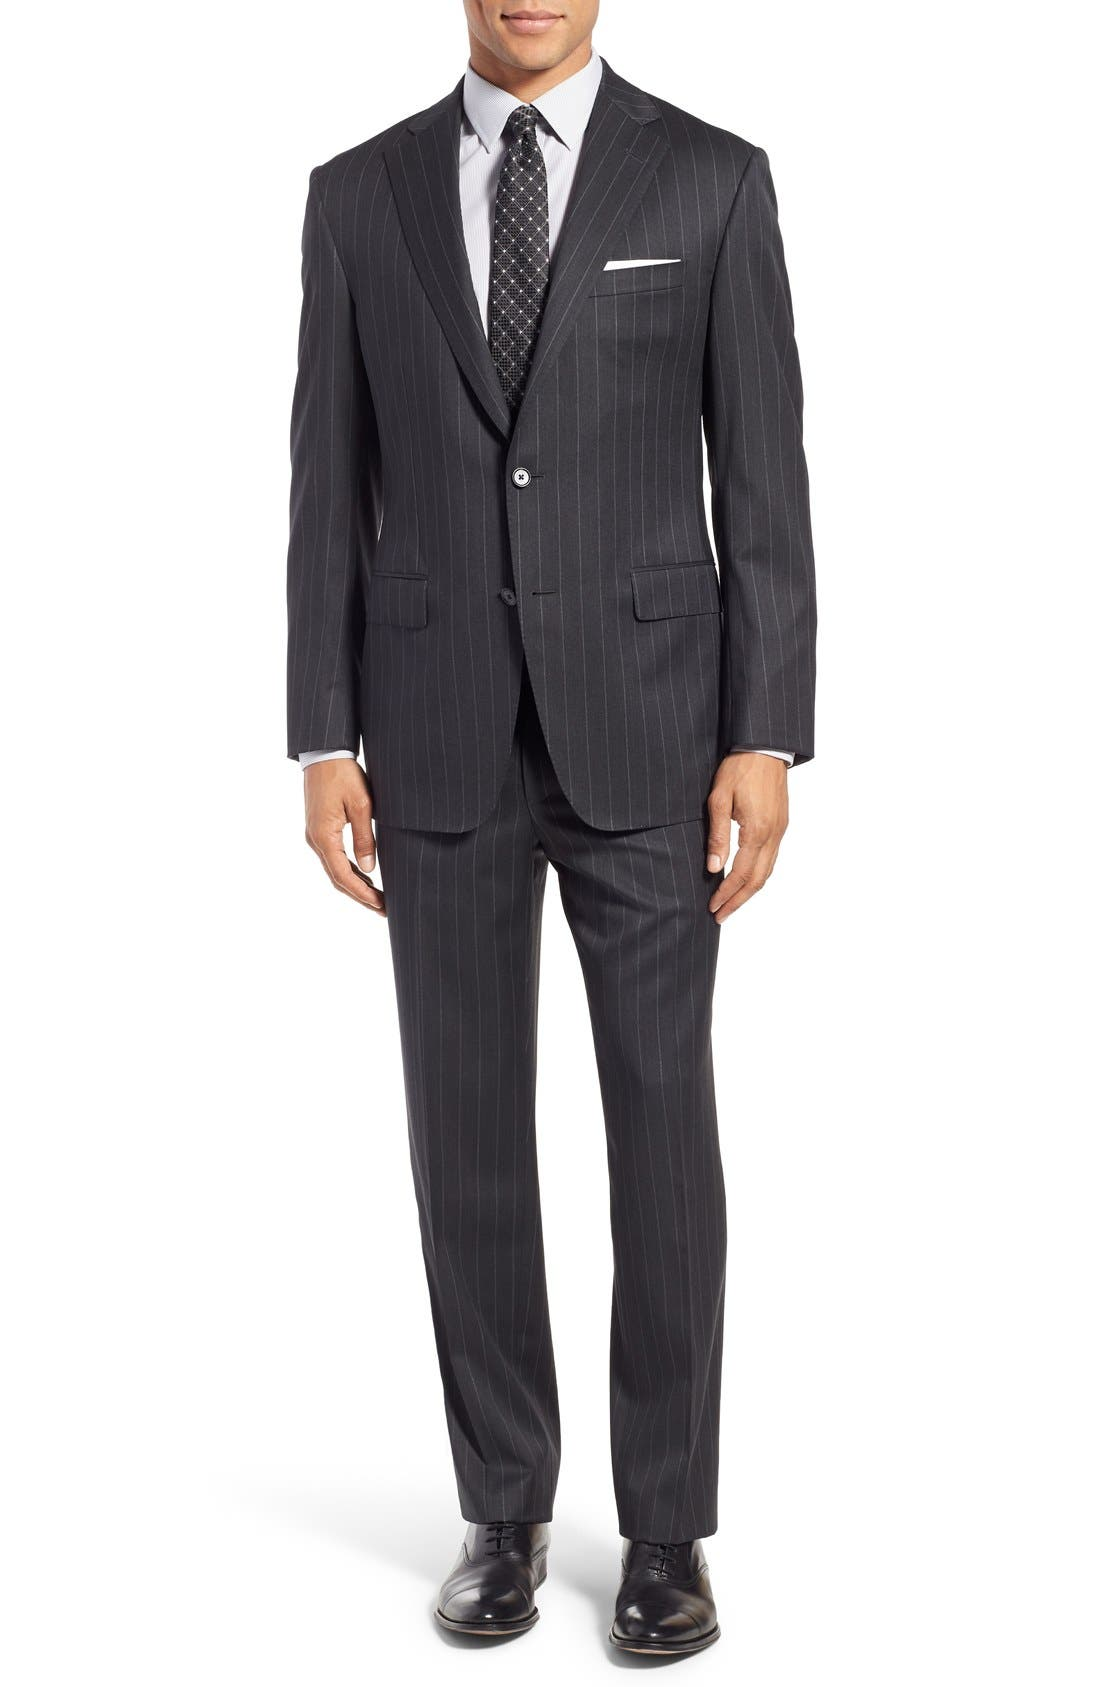 SAMUELSOHN, Classic Fit Stripe Wool Suit, Main thumbnail 1, color, 025